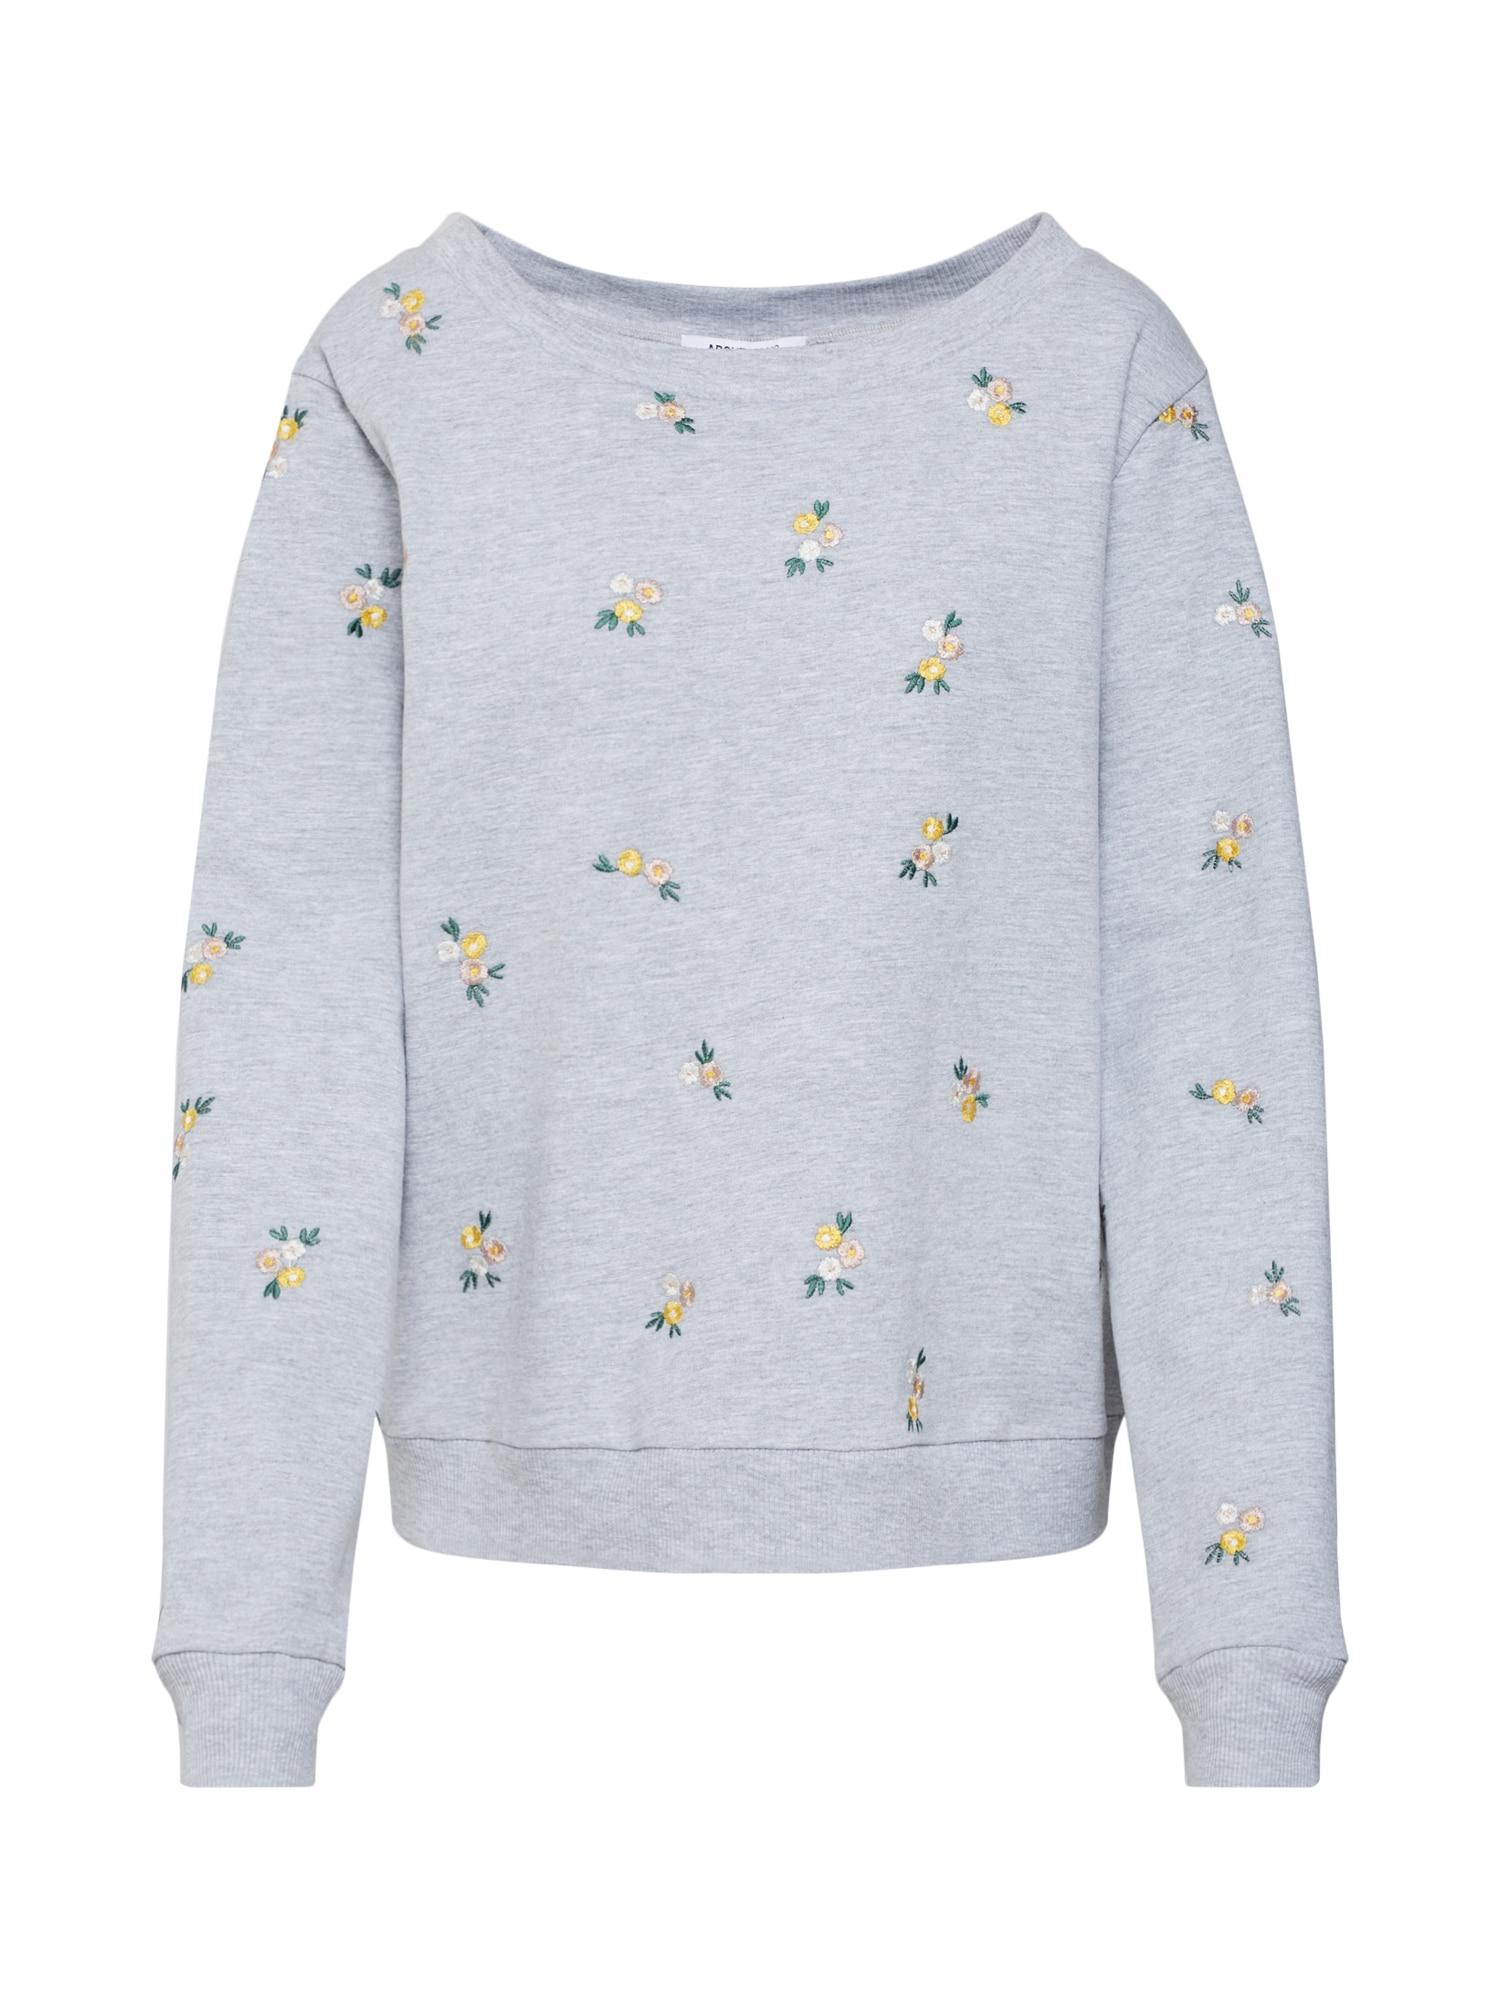 ABOUT YOU, Dames Sweatshirt 'Luna', grijs